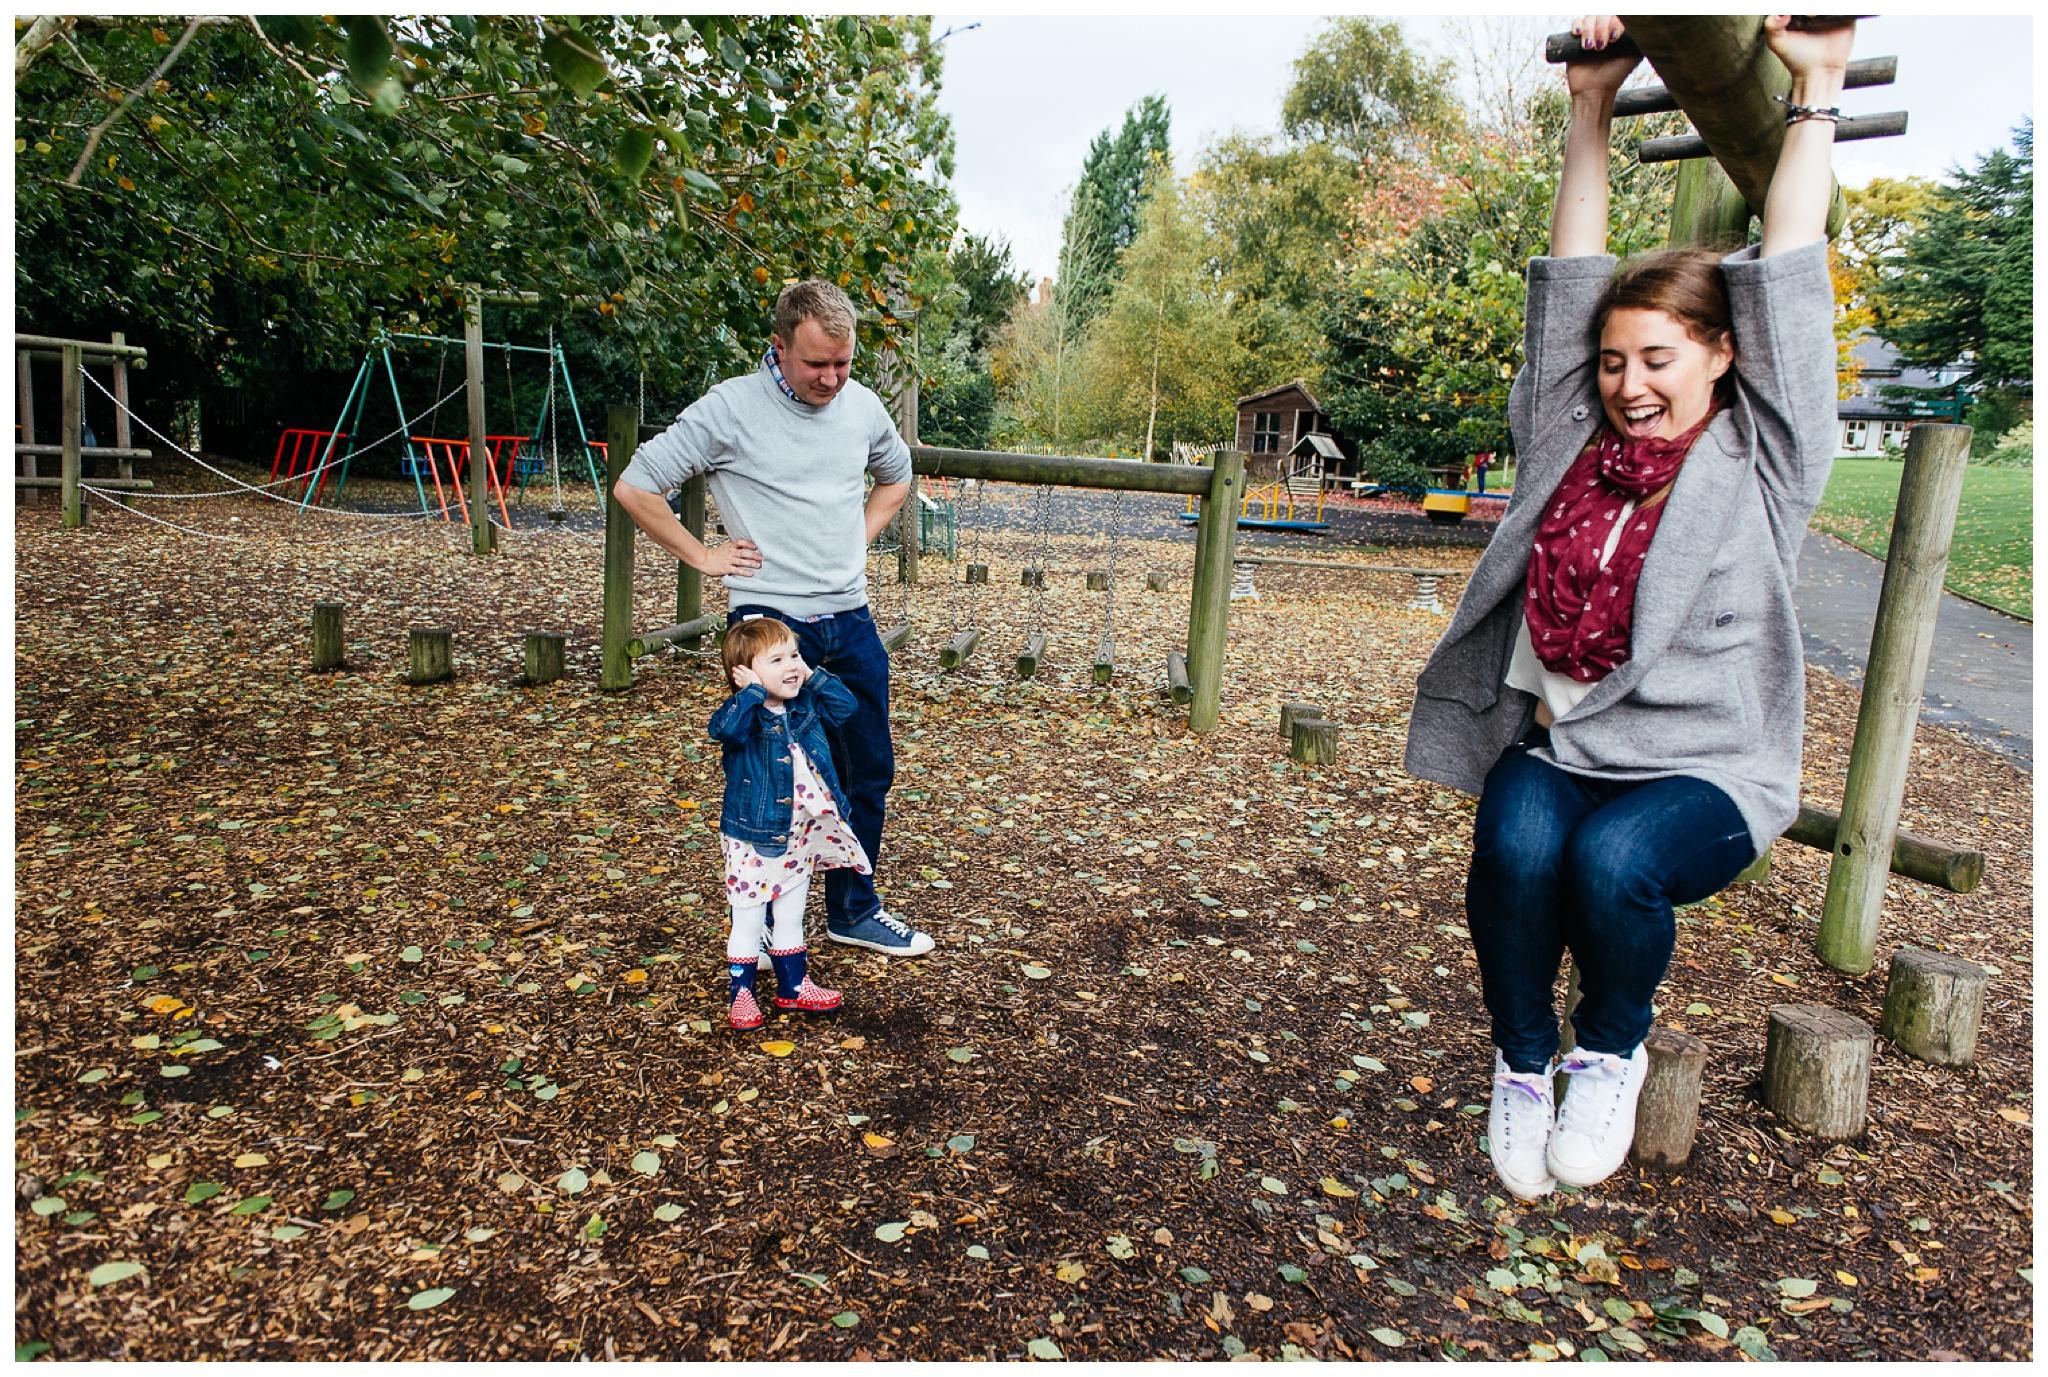 Autumn-family-portraits-birmingham-photographer_0012.jpg